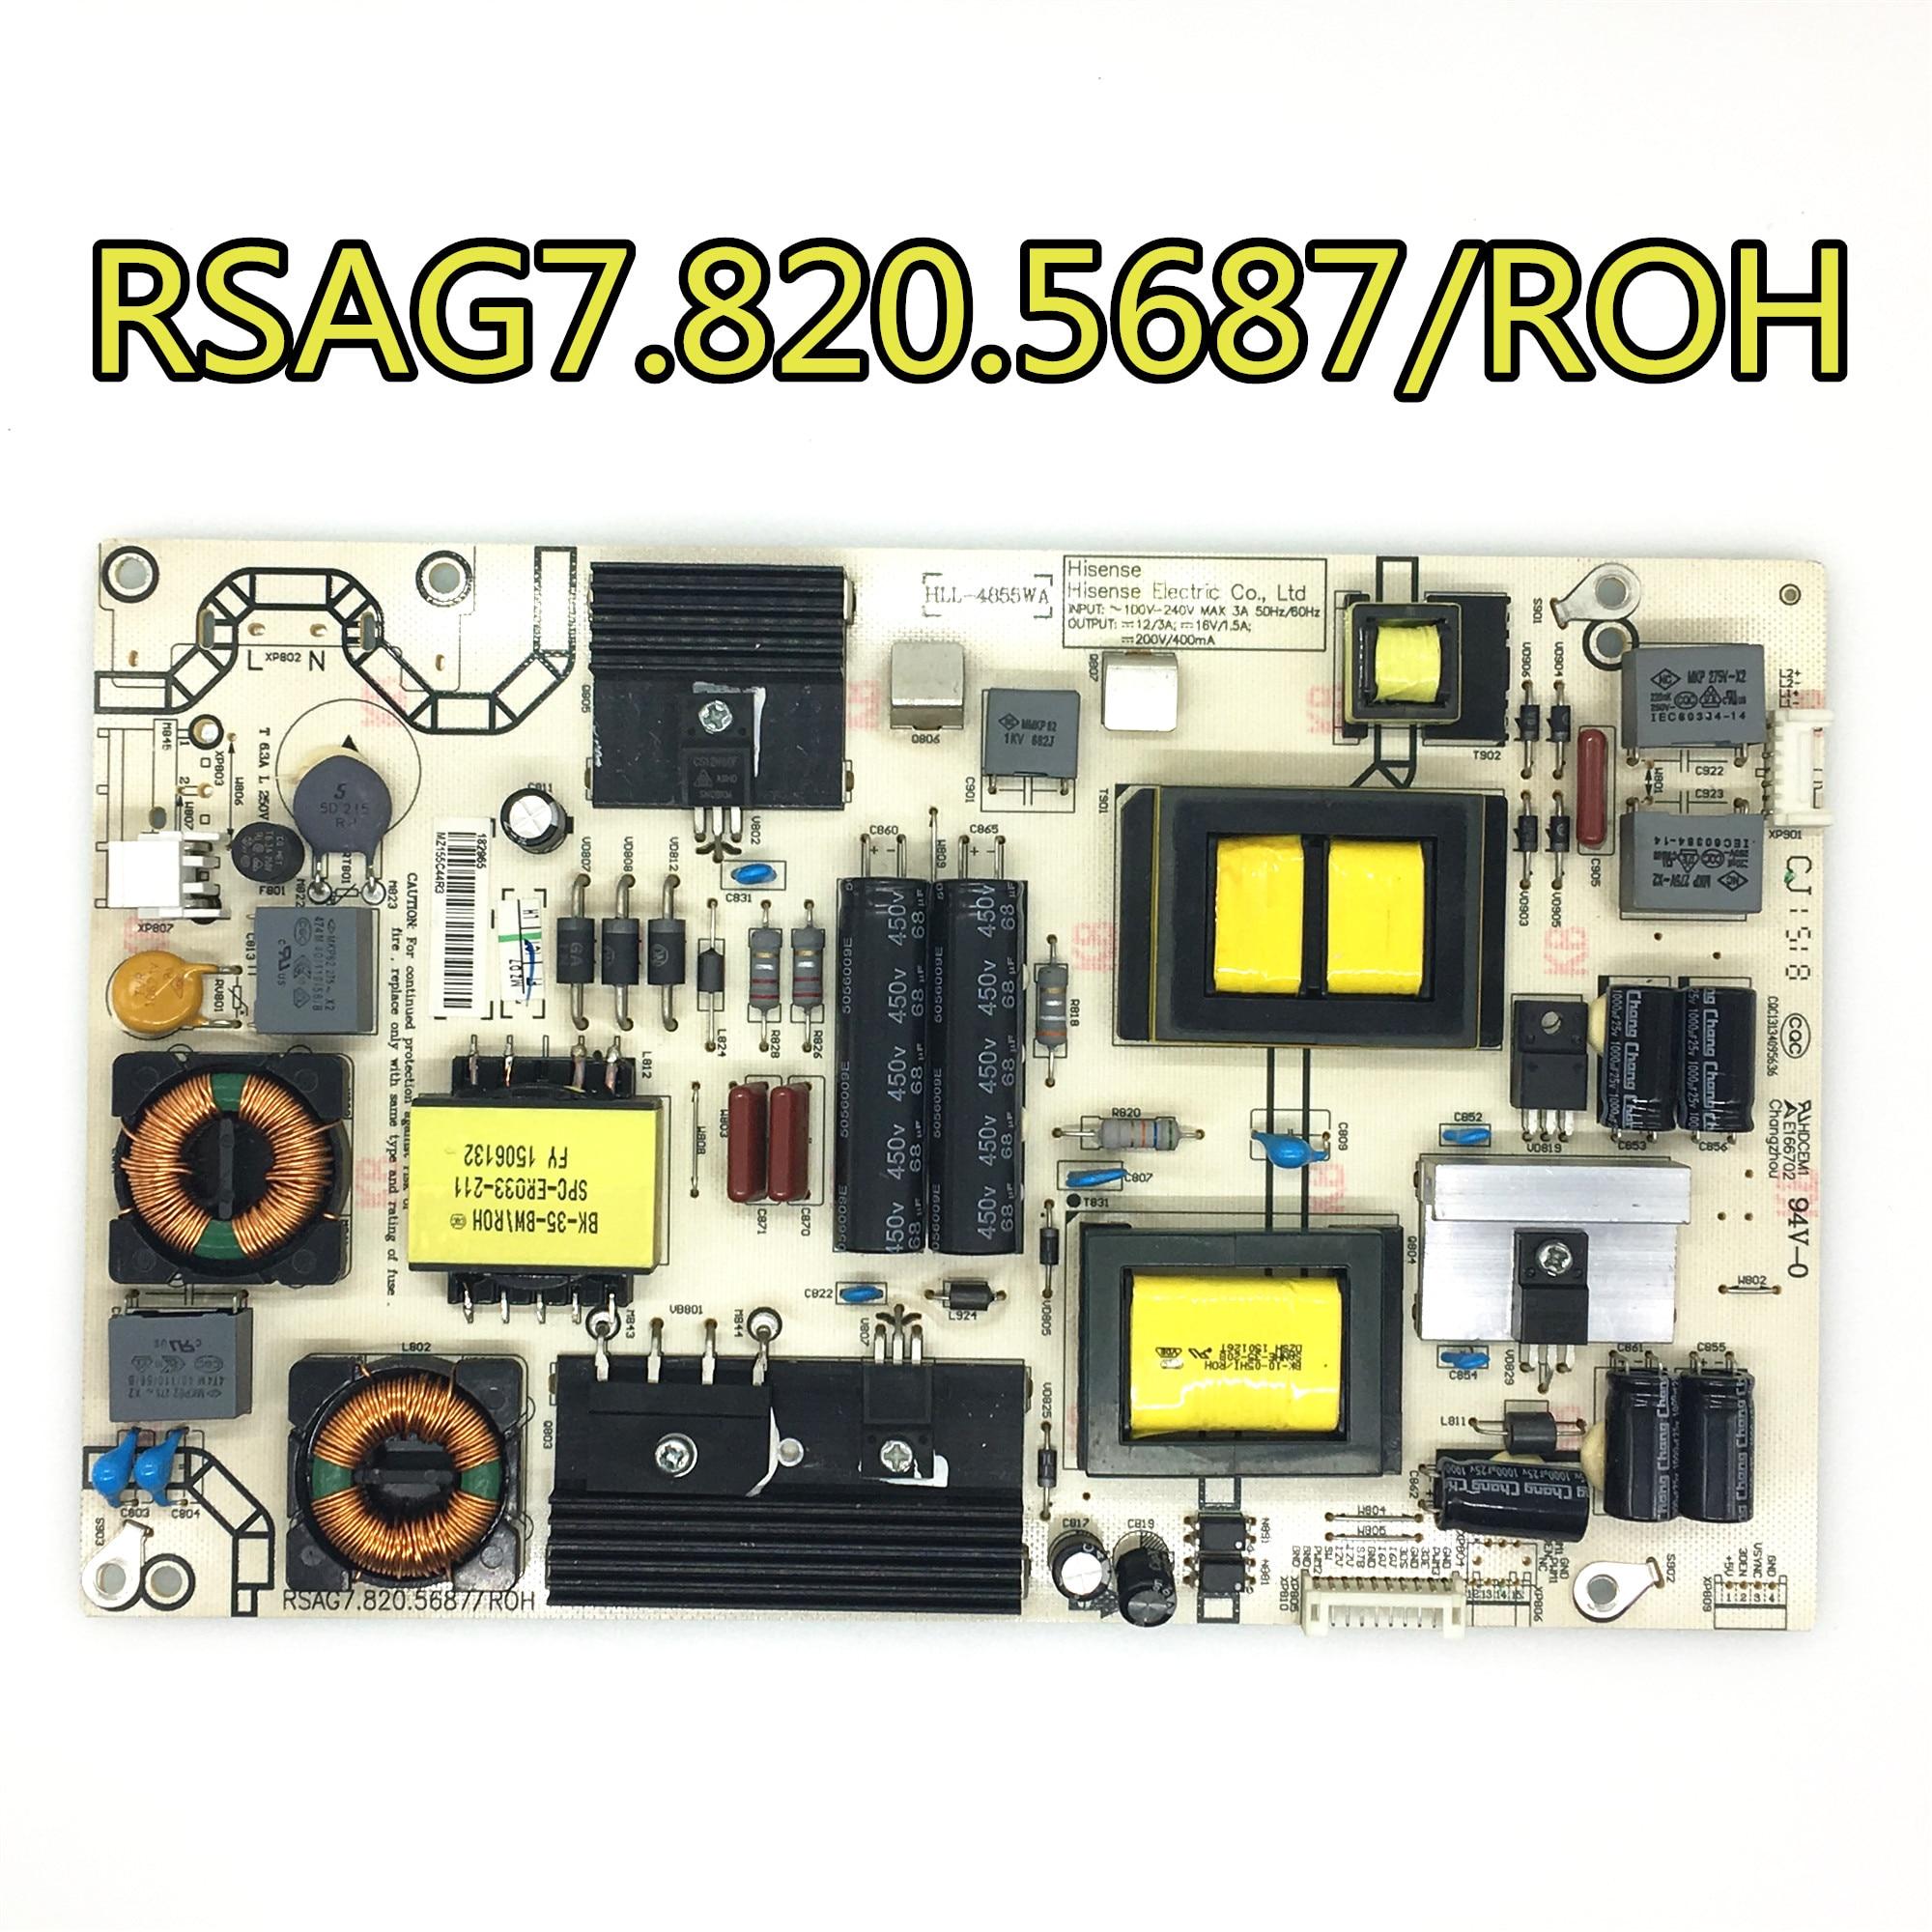 Prueba de 100% original para LED42K380U/LED55K370/LED50K320U, placa de alimentación RSAG7.820.5687/ROH